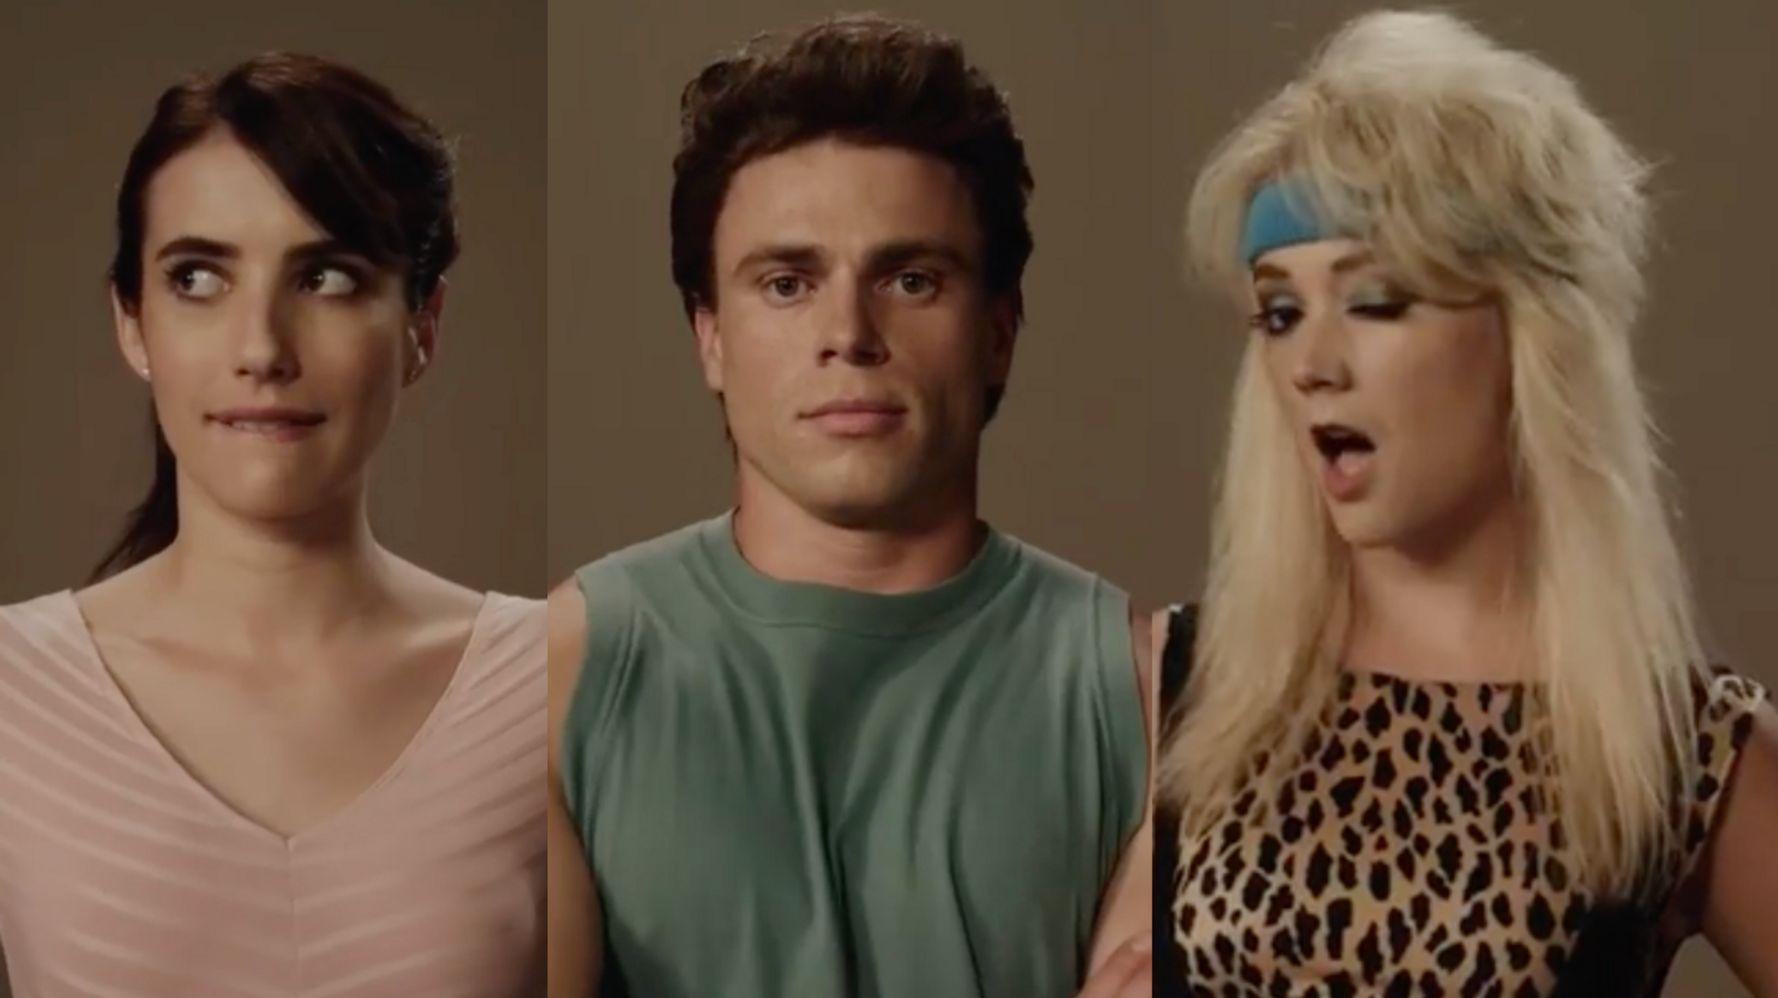 imagen de american horror story 1984 personajes